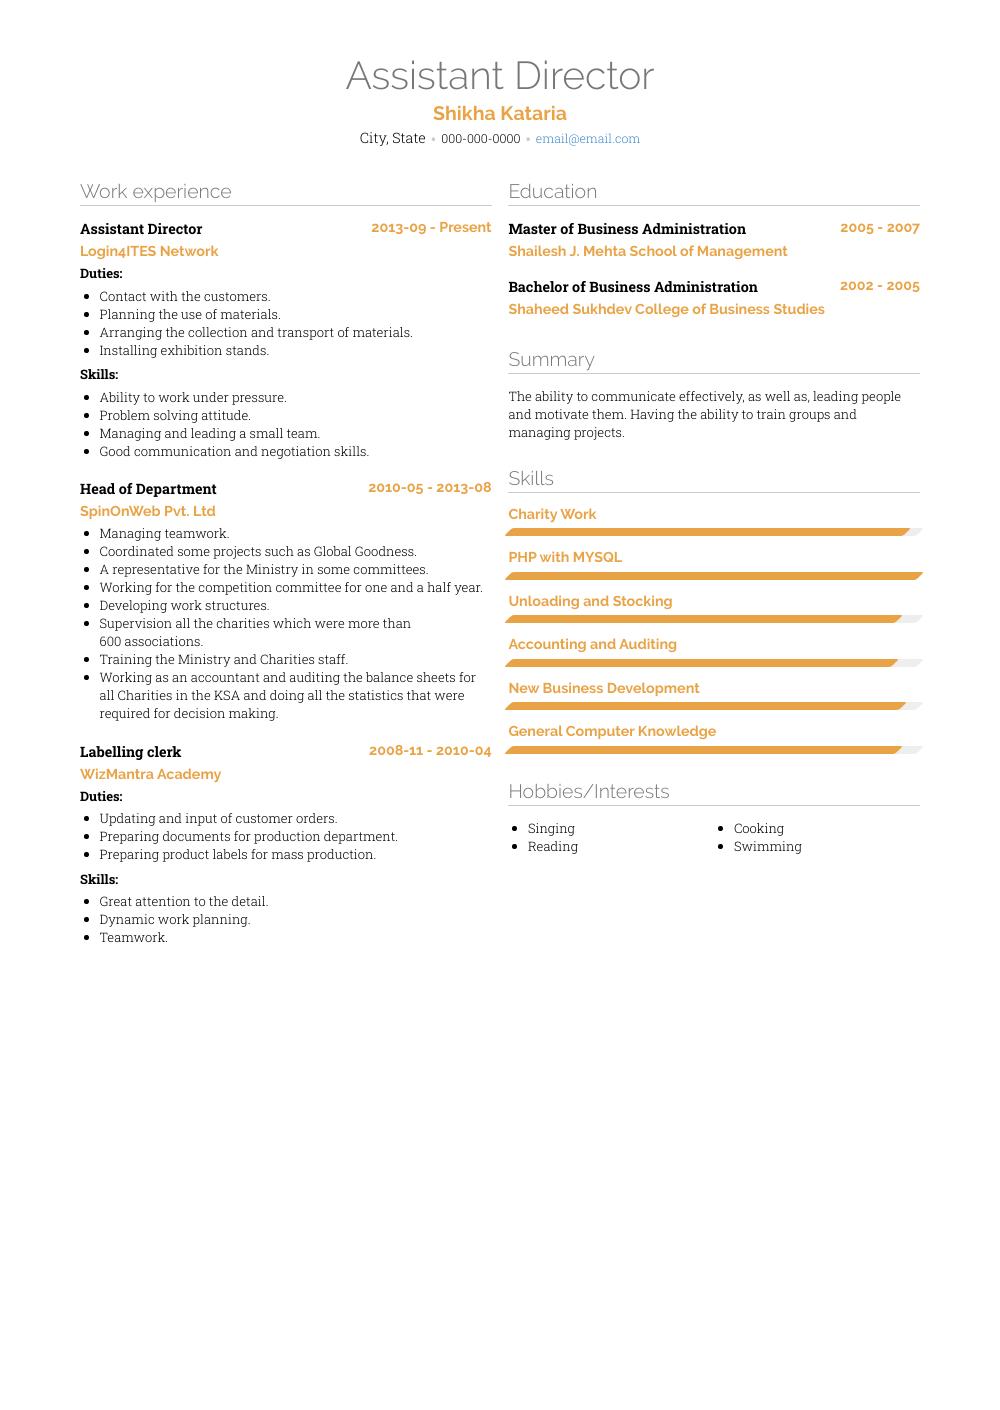 resume model for assistant director